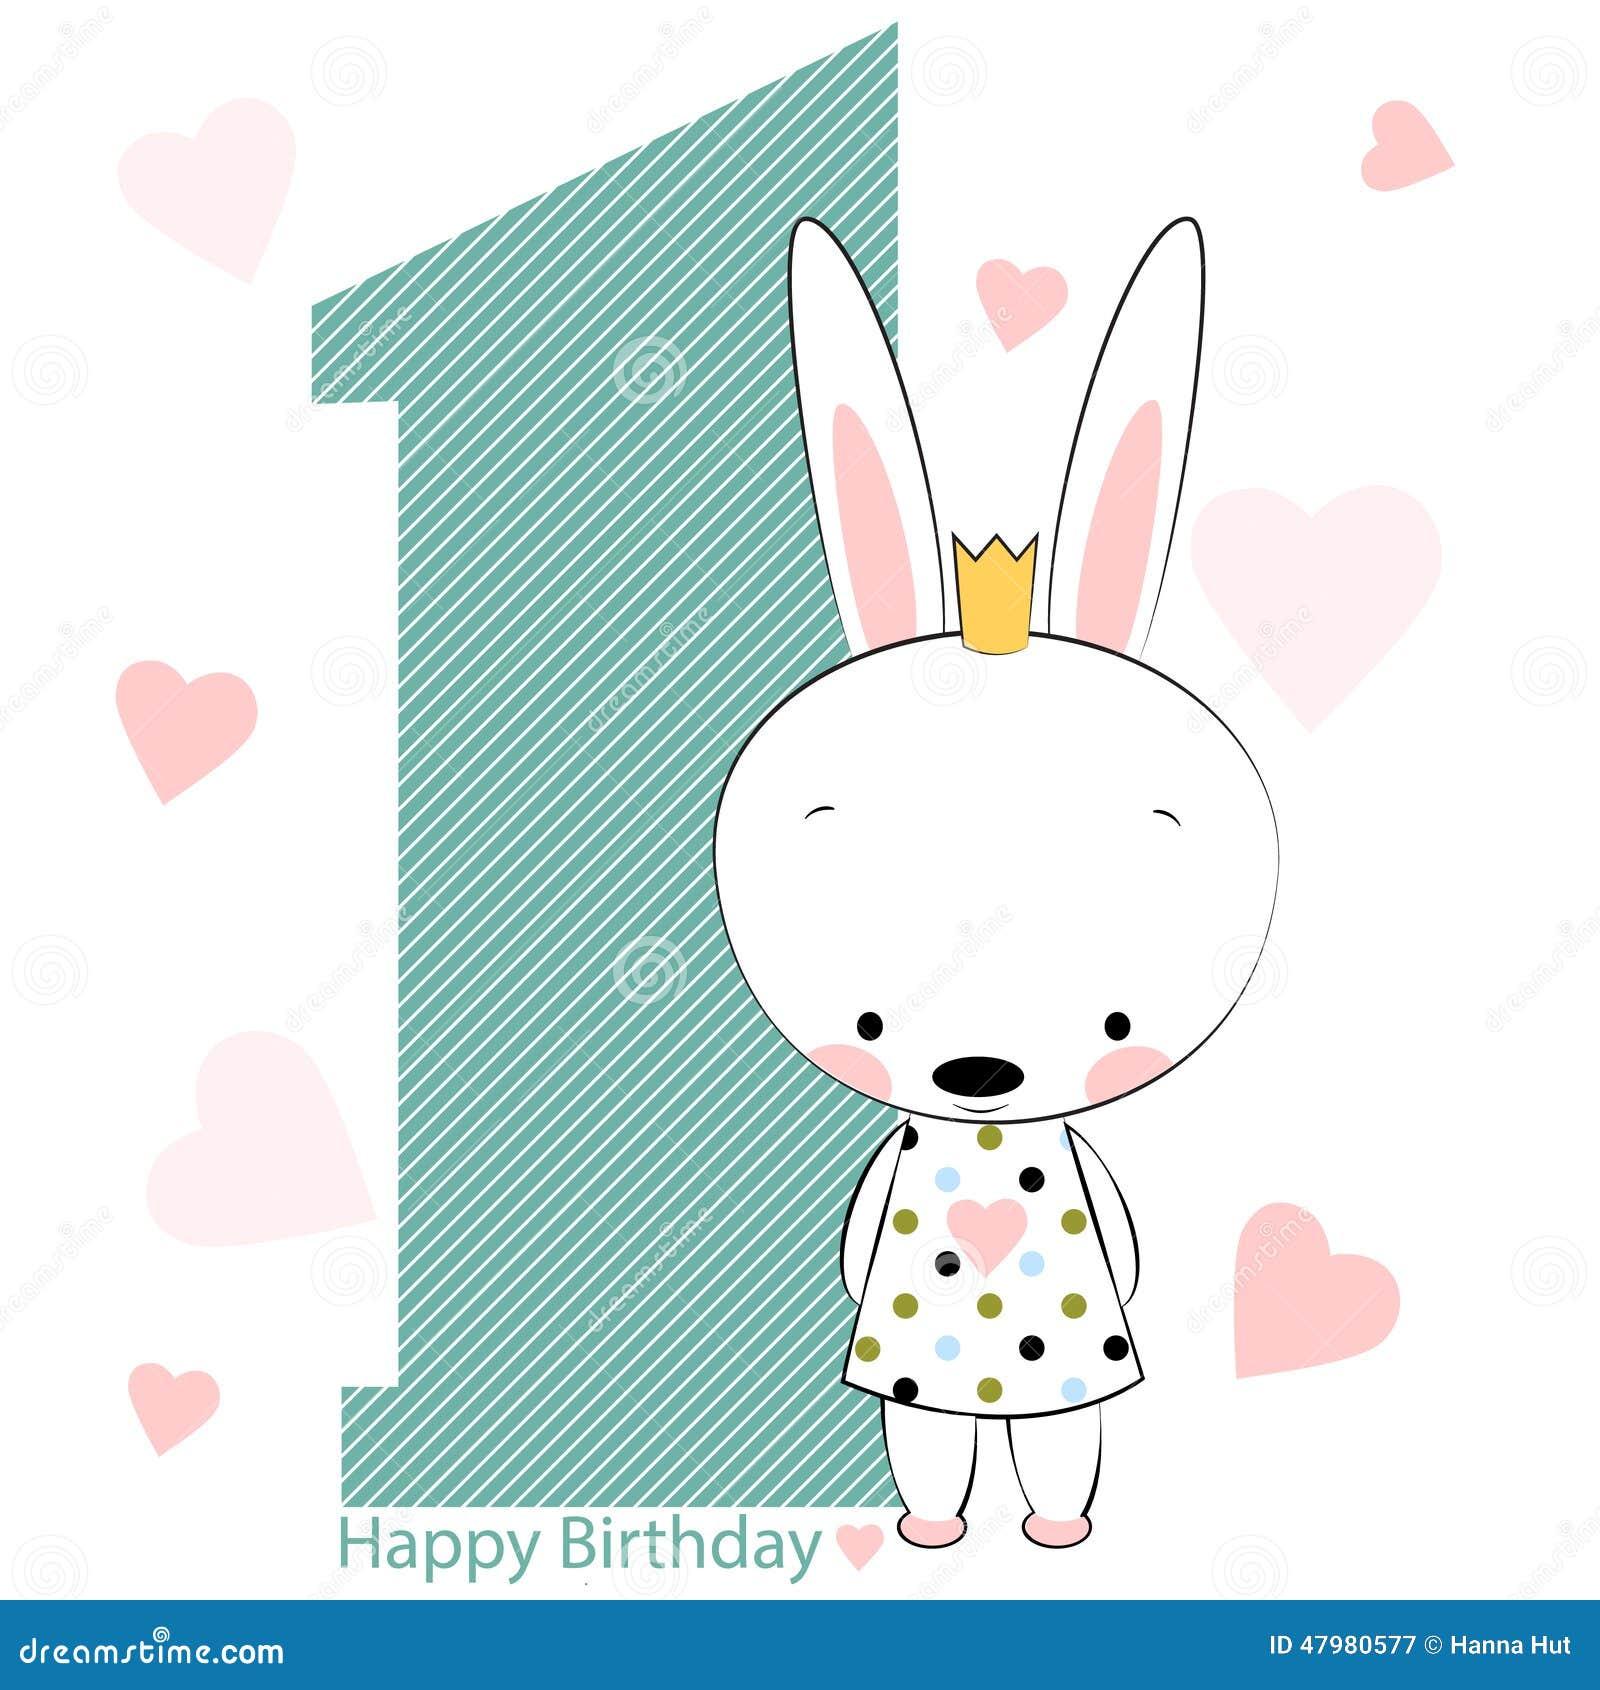 Happy Birthday Girl Illustration ~ Card on happy birthday with bunny girl stock vector image